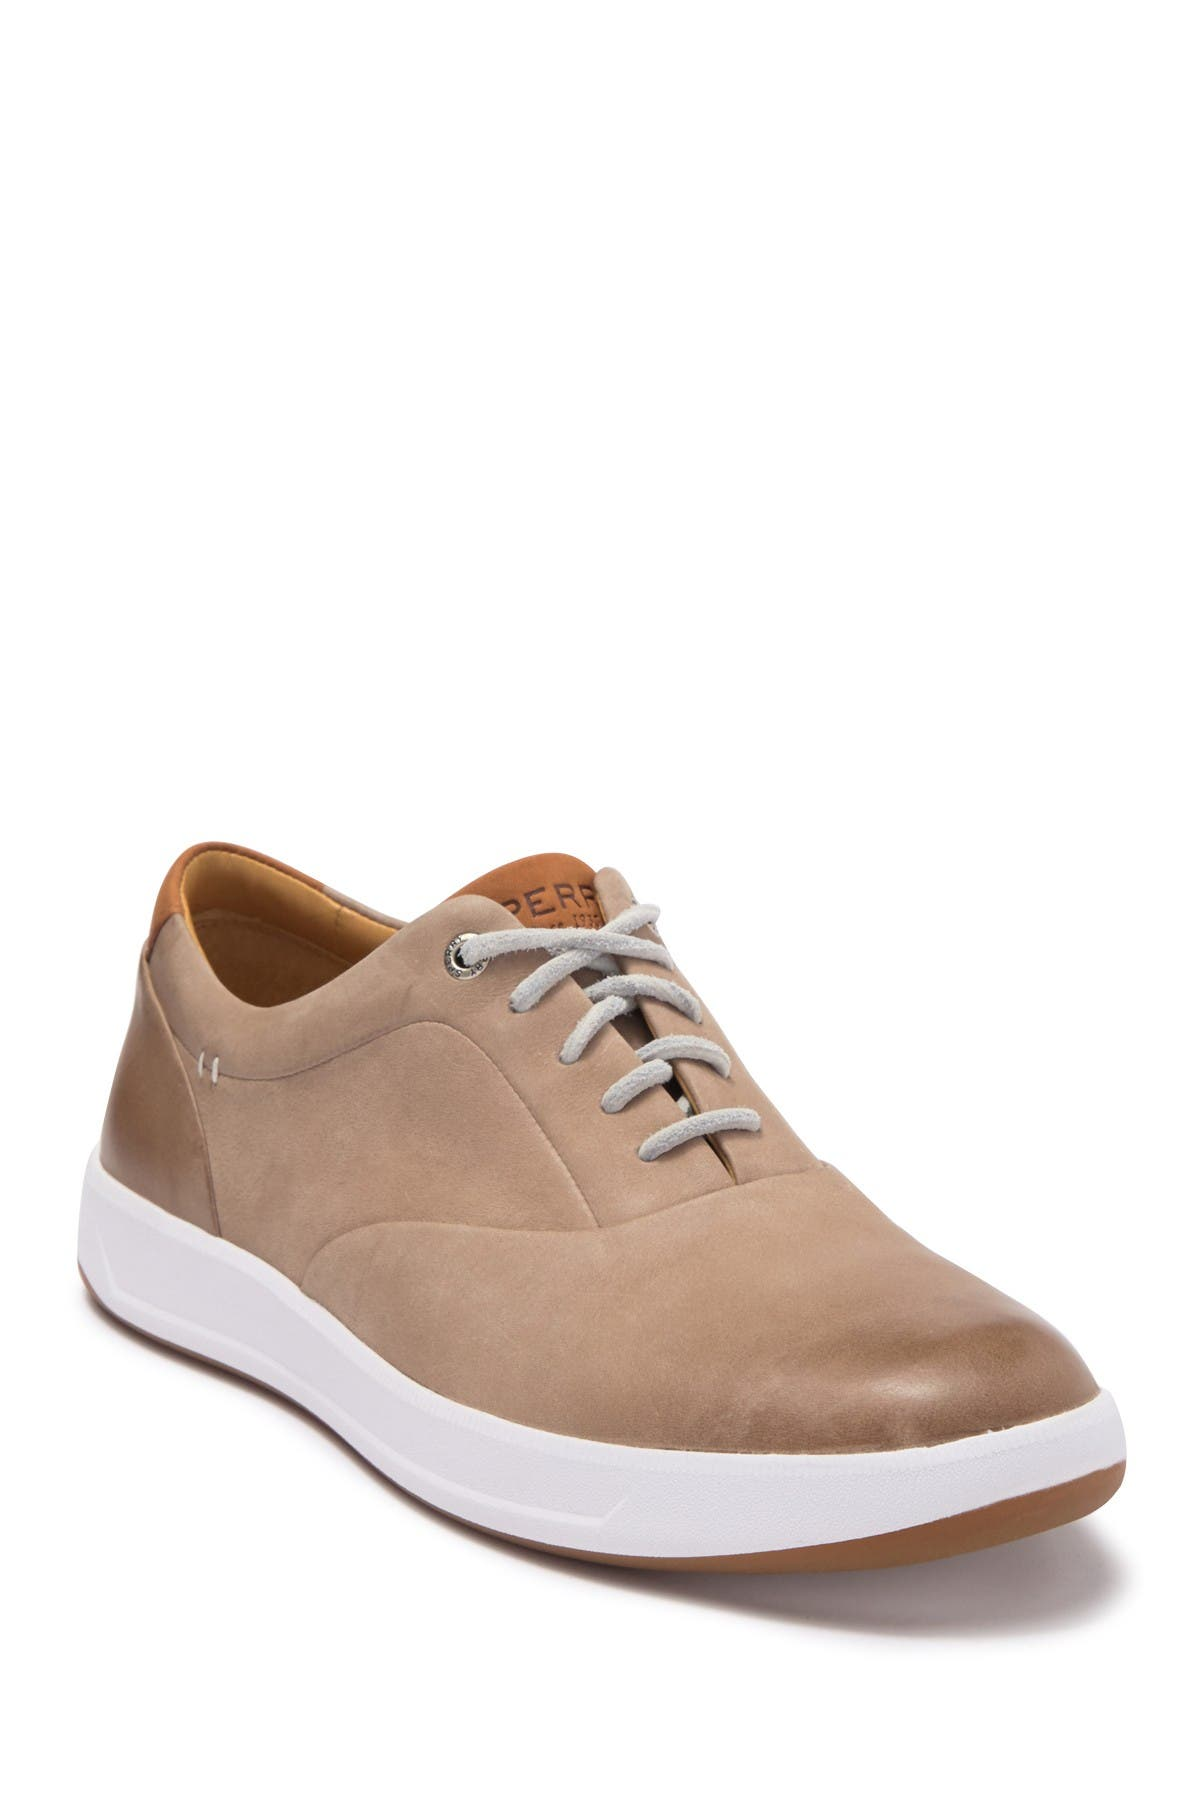 Sperry | Gold Cup Richfield CVO Sneaker